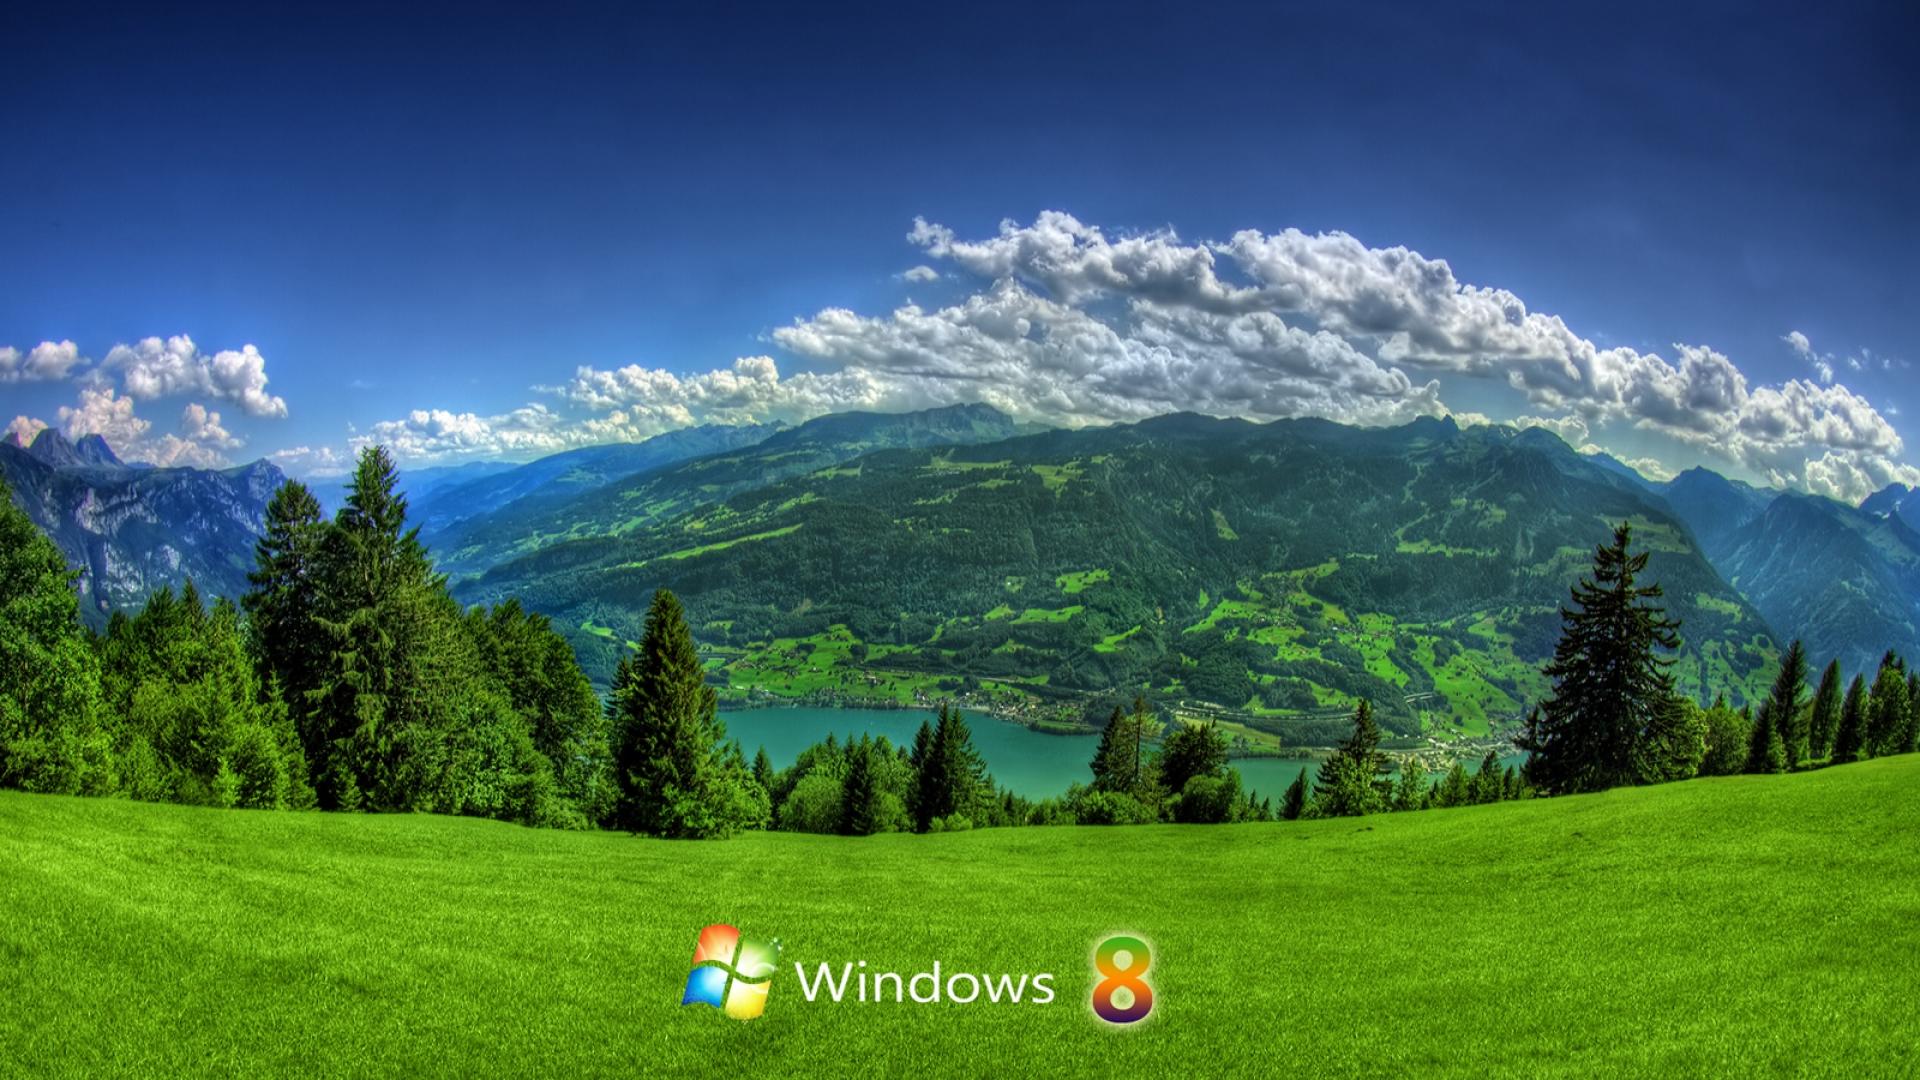 download wallpaper windows 8 High Definition HD Wallpapers 1920x1080